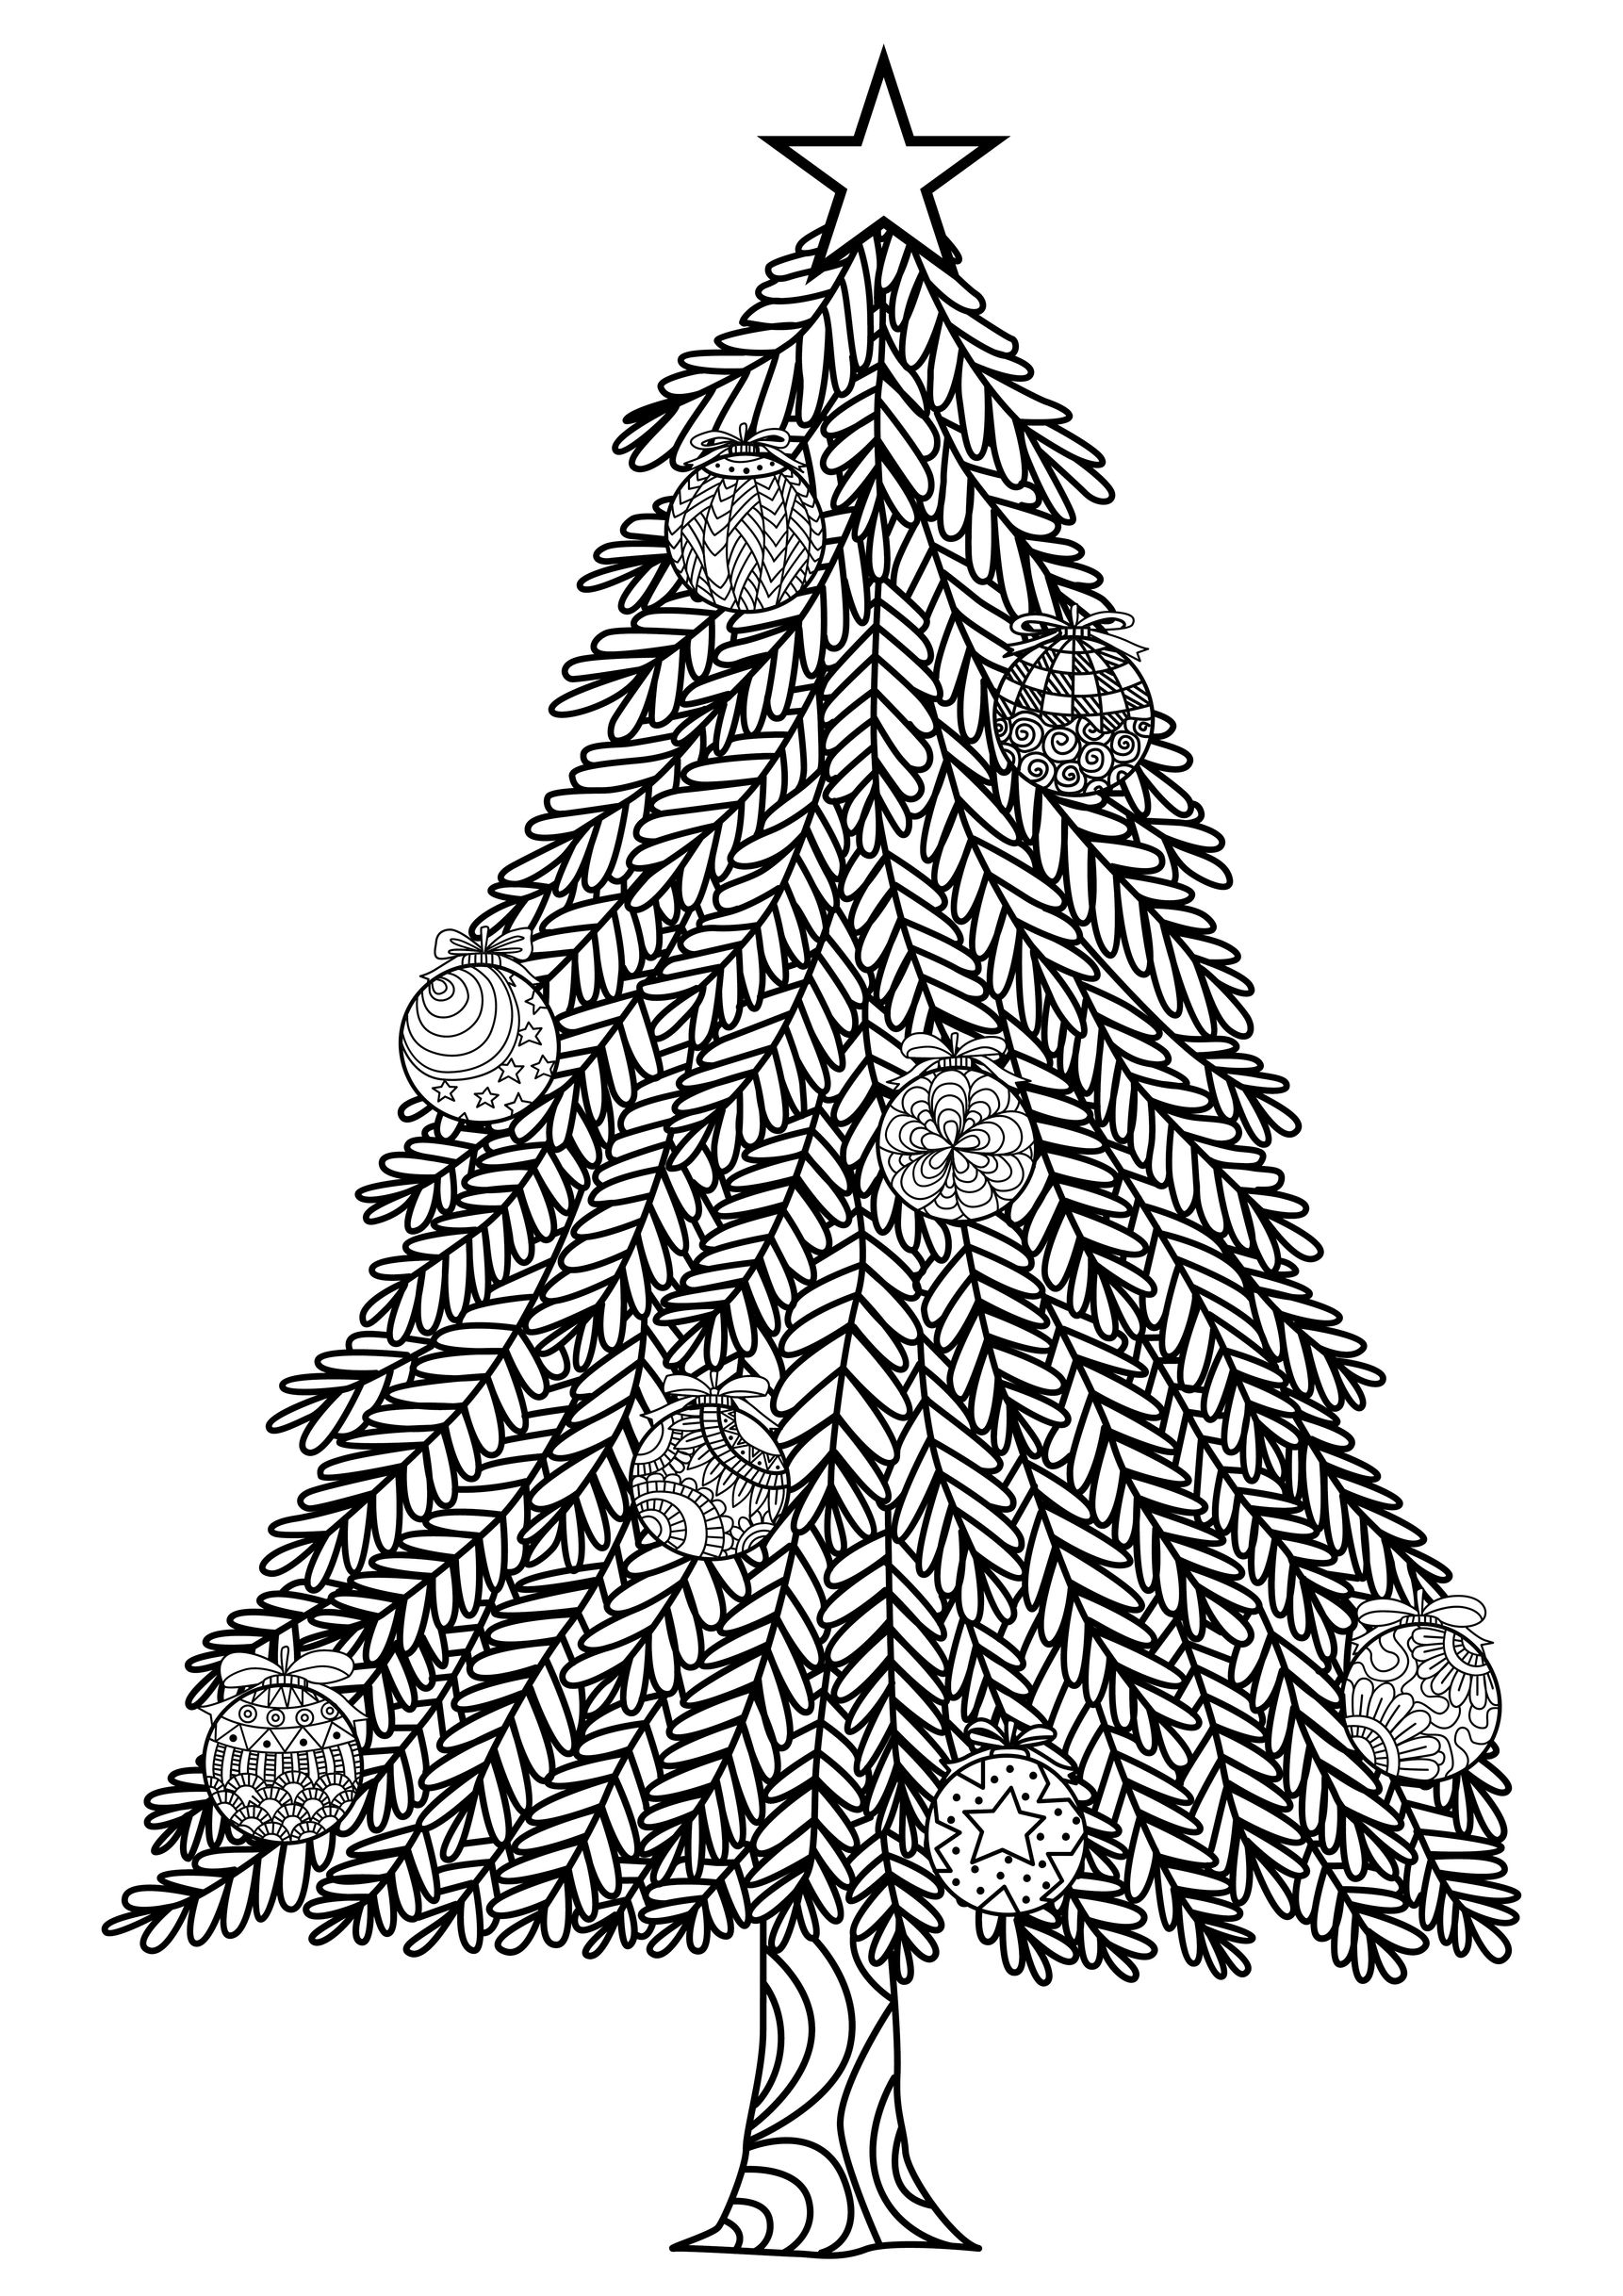 Hand drawn christmas tree zentangle style with christmas balls and gift boxes.